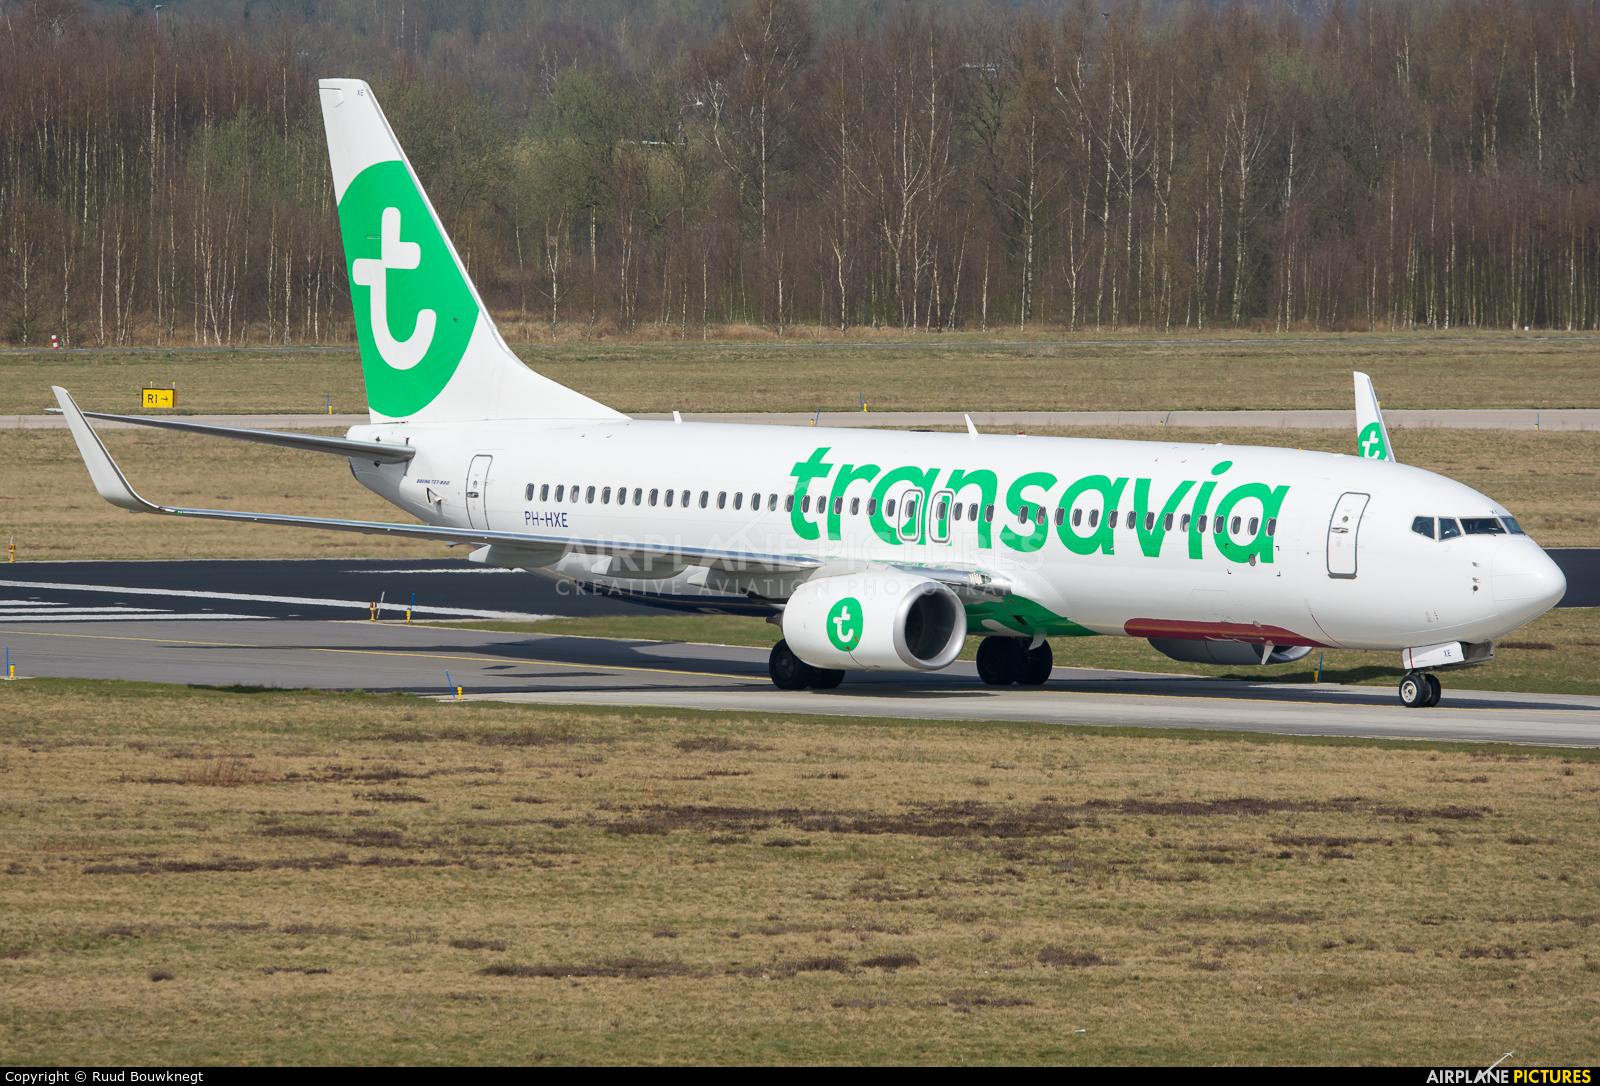 Transavia PH-HXE aircraft at Eindhoven